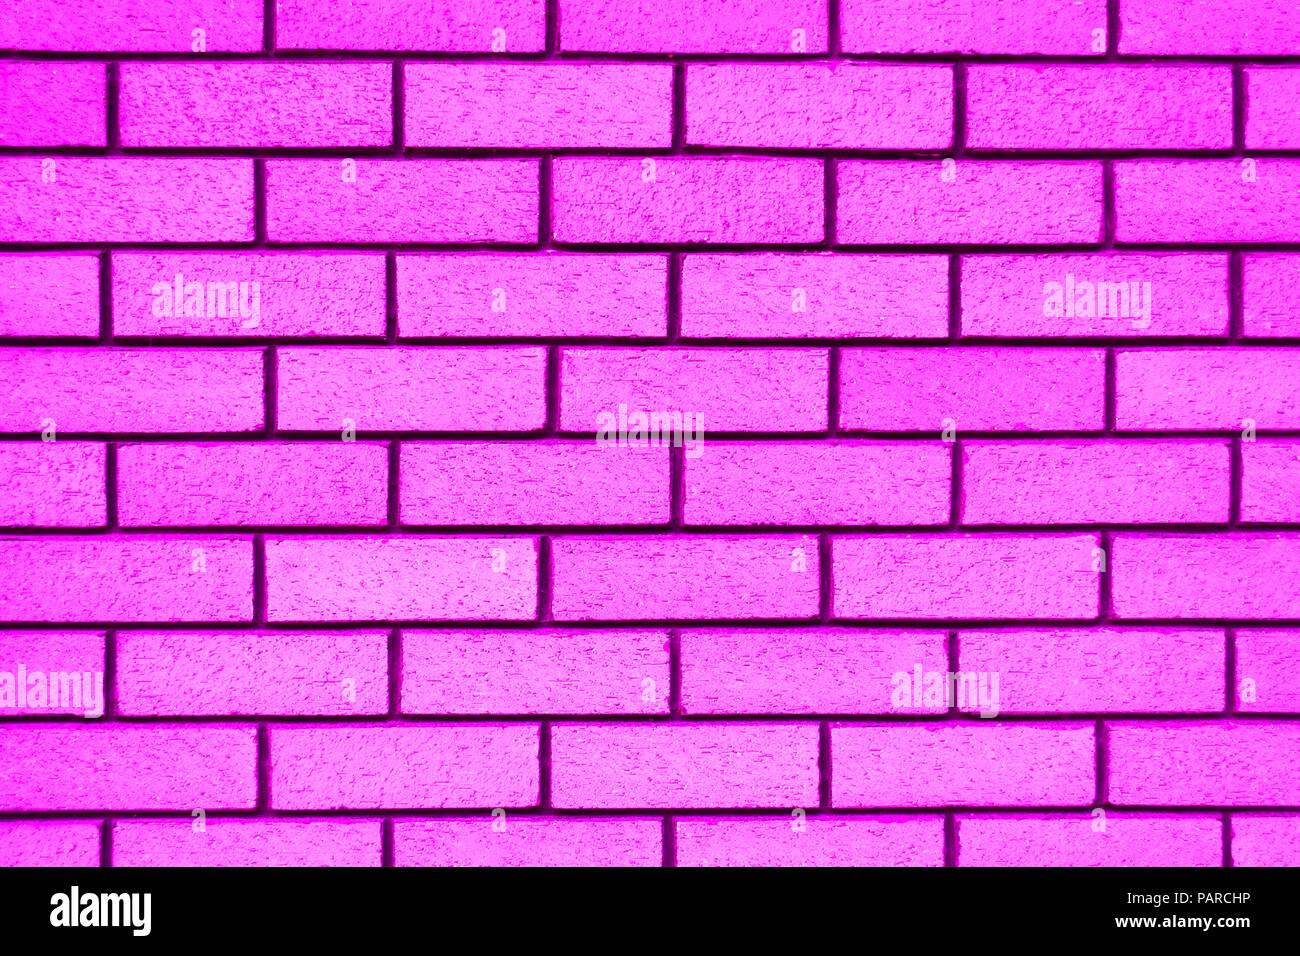 pink brick wall background